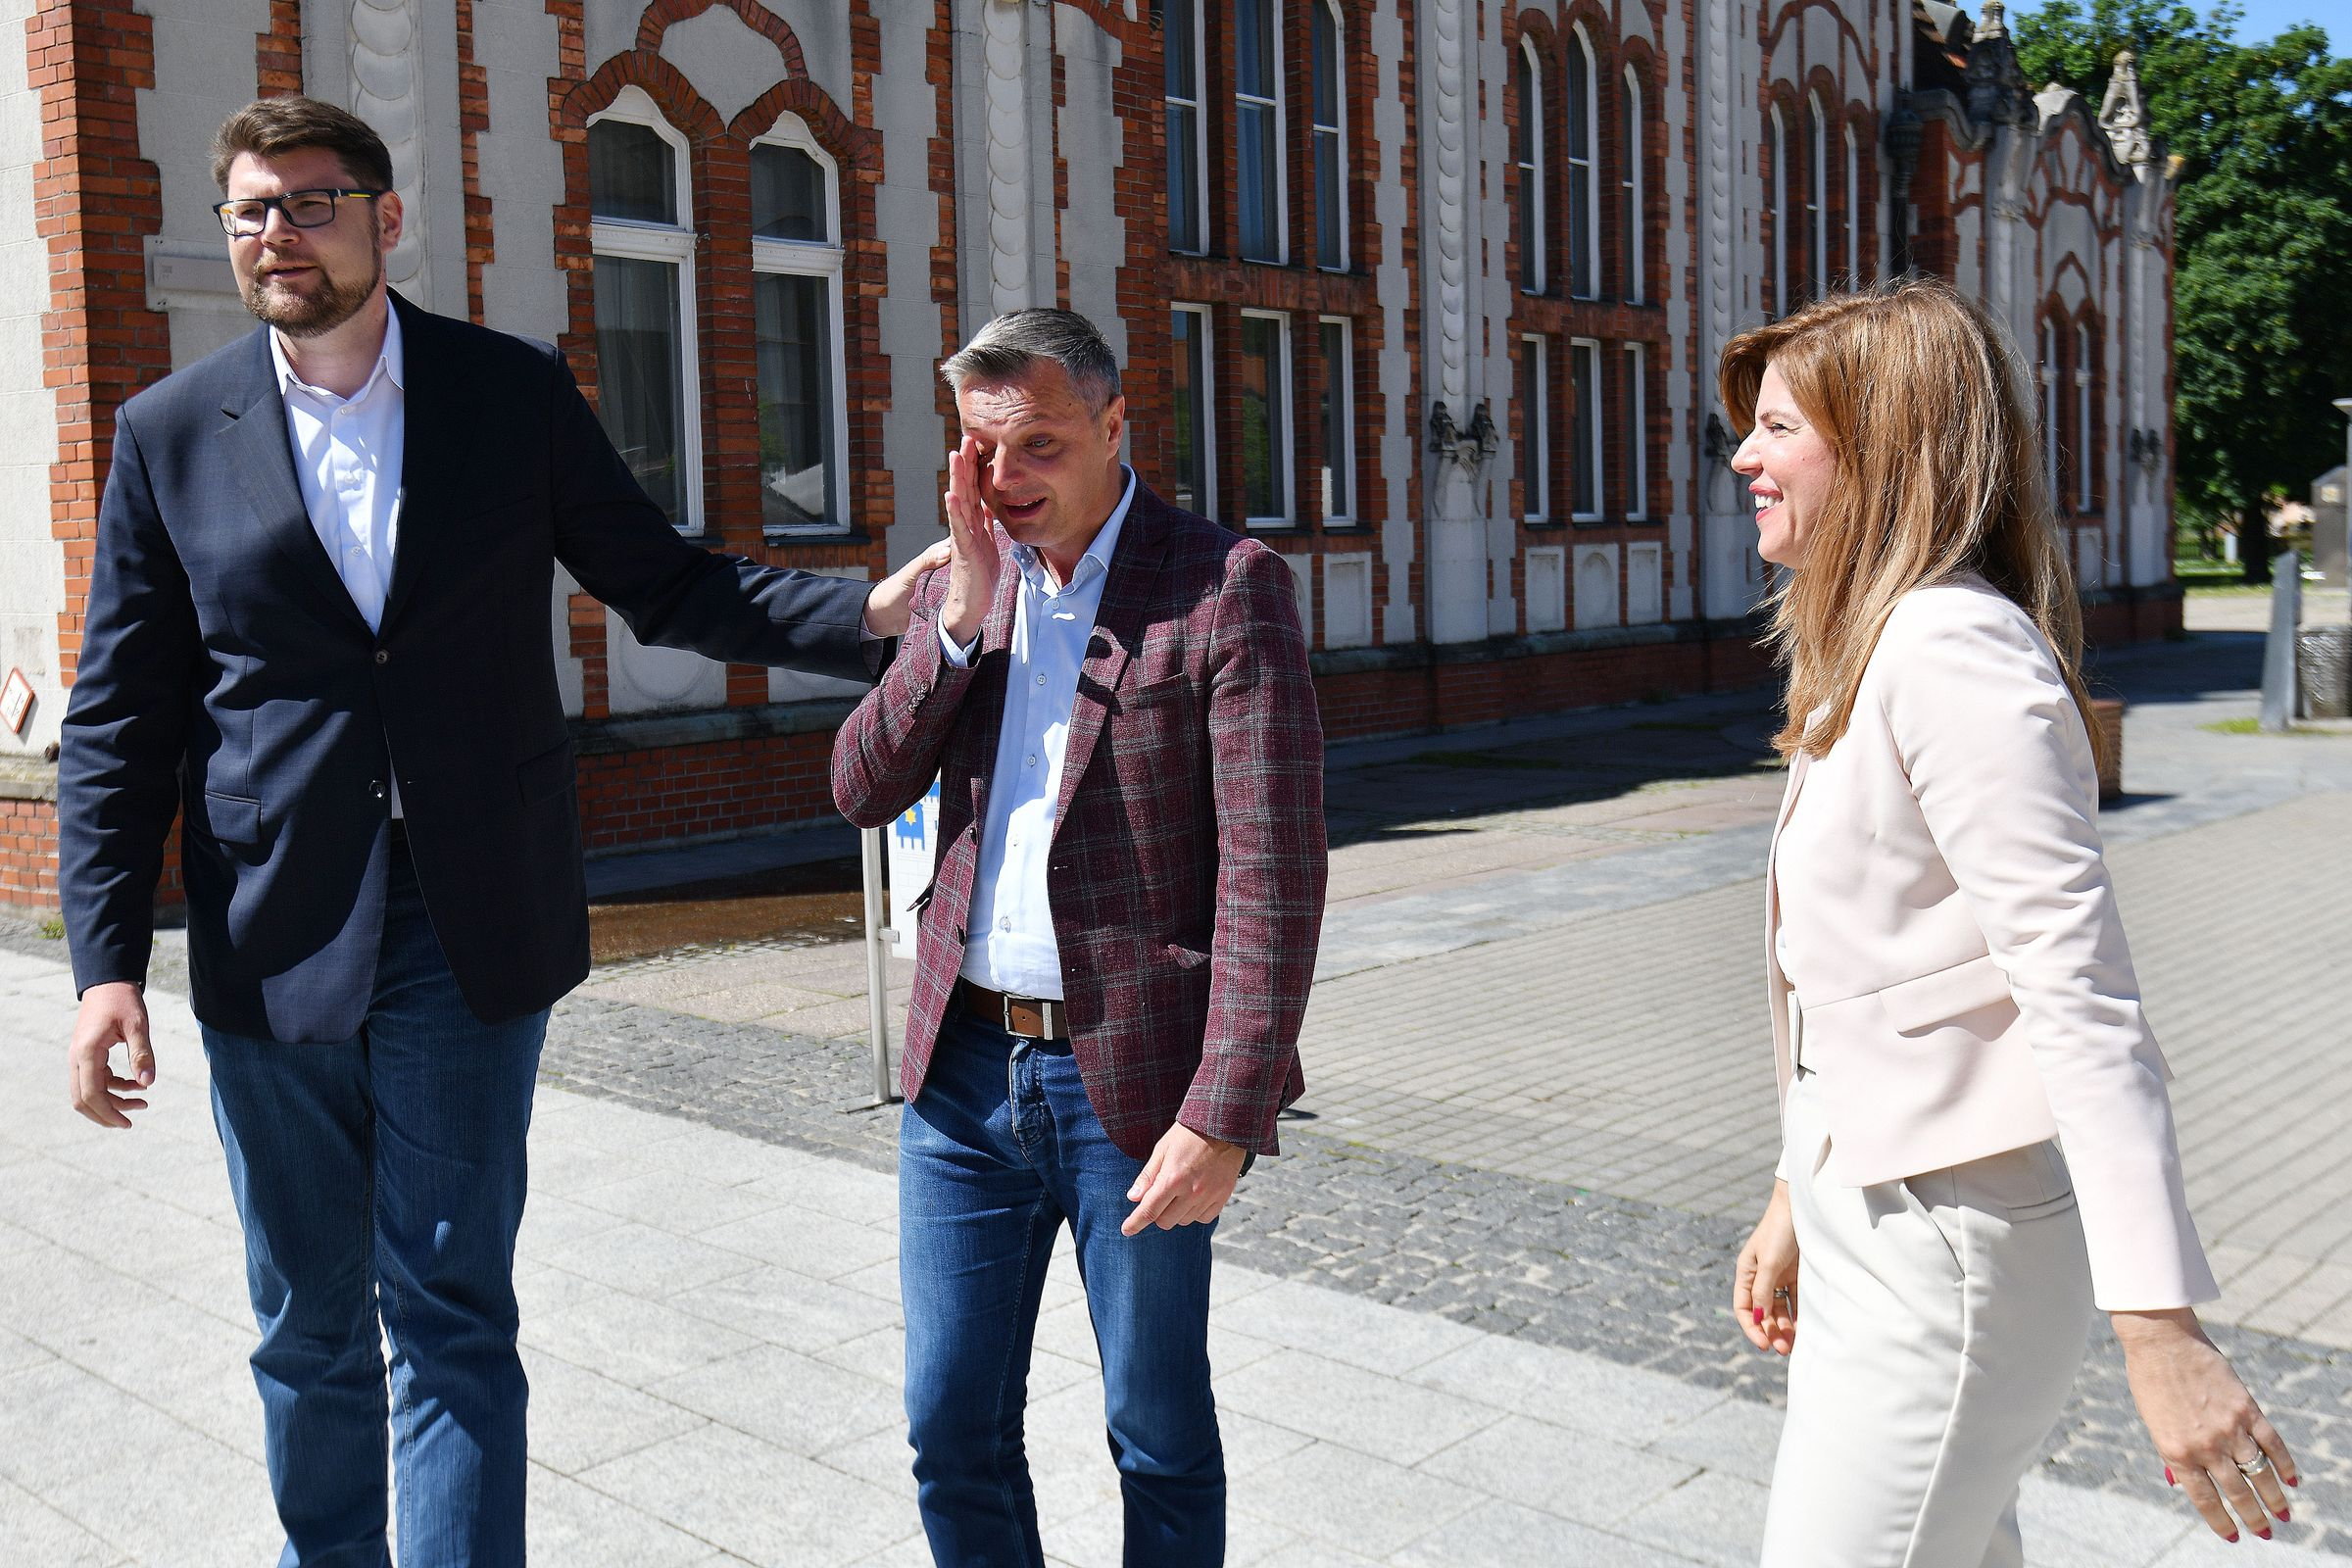 Stjepan Kovač plače dok ga tješe Peđa Grbin i Biljana Borzan / Foto Vjeran Zganec Rogulja/PIXSELL